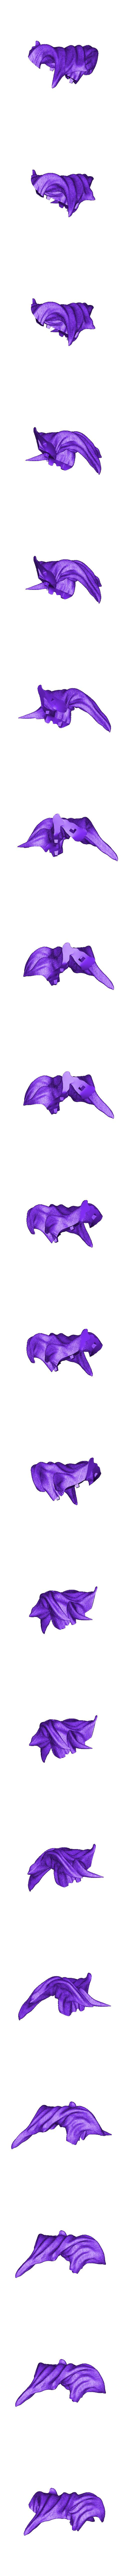 Capa-03.stl Download free STL file Batman 3d sculpture tested and ready for printing by B3DSERK Studios • 3D printer object, b3dserk